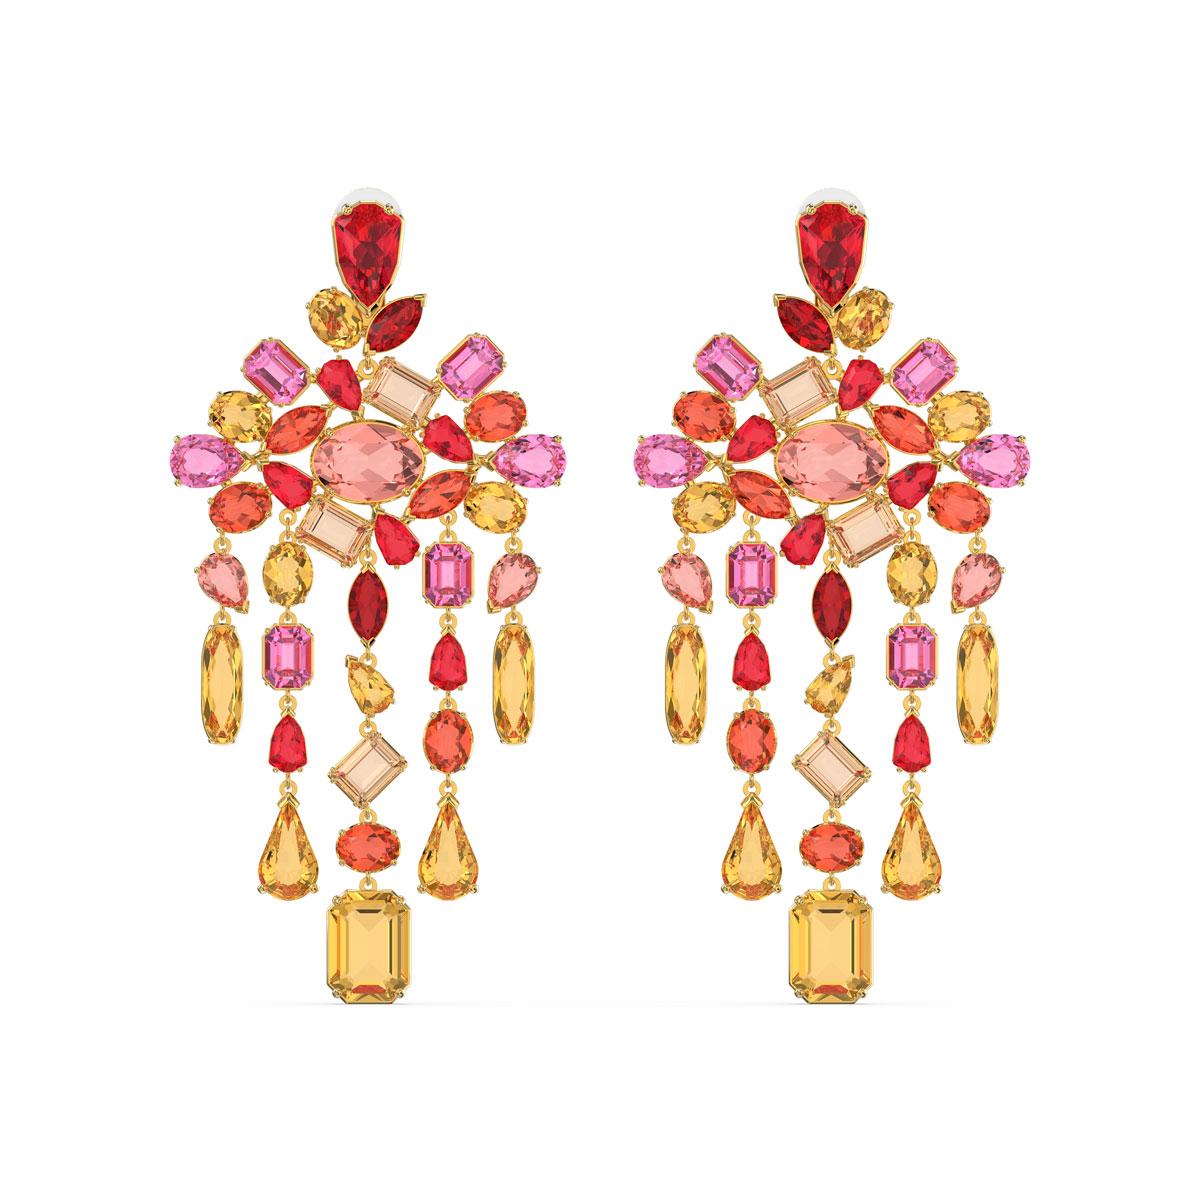 Swarovski Gema Clip Earrings, Chandelier, Multicolored, Gold-Tone Plated, Pair